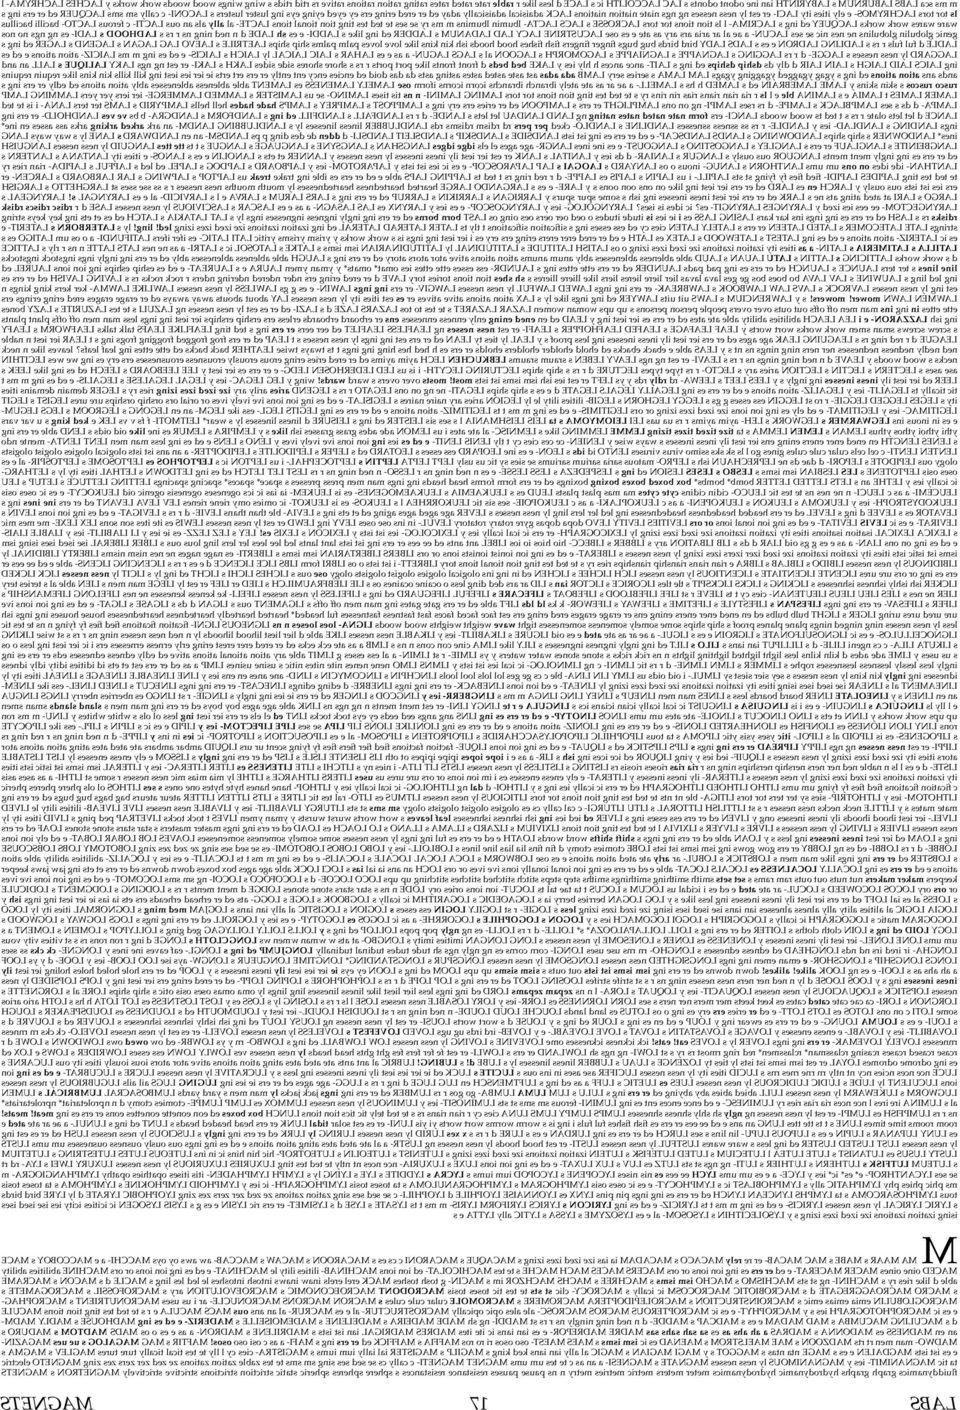 Confuzzle: A Wordlist (View 20 of 20)